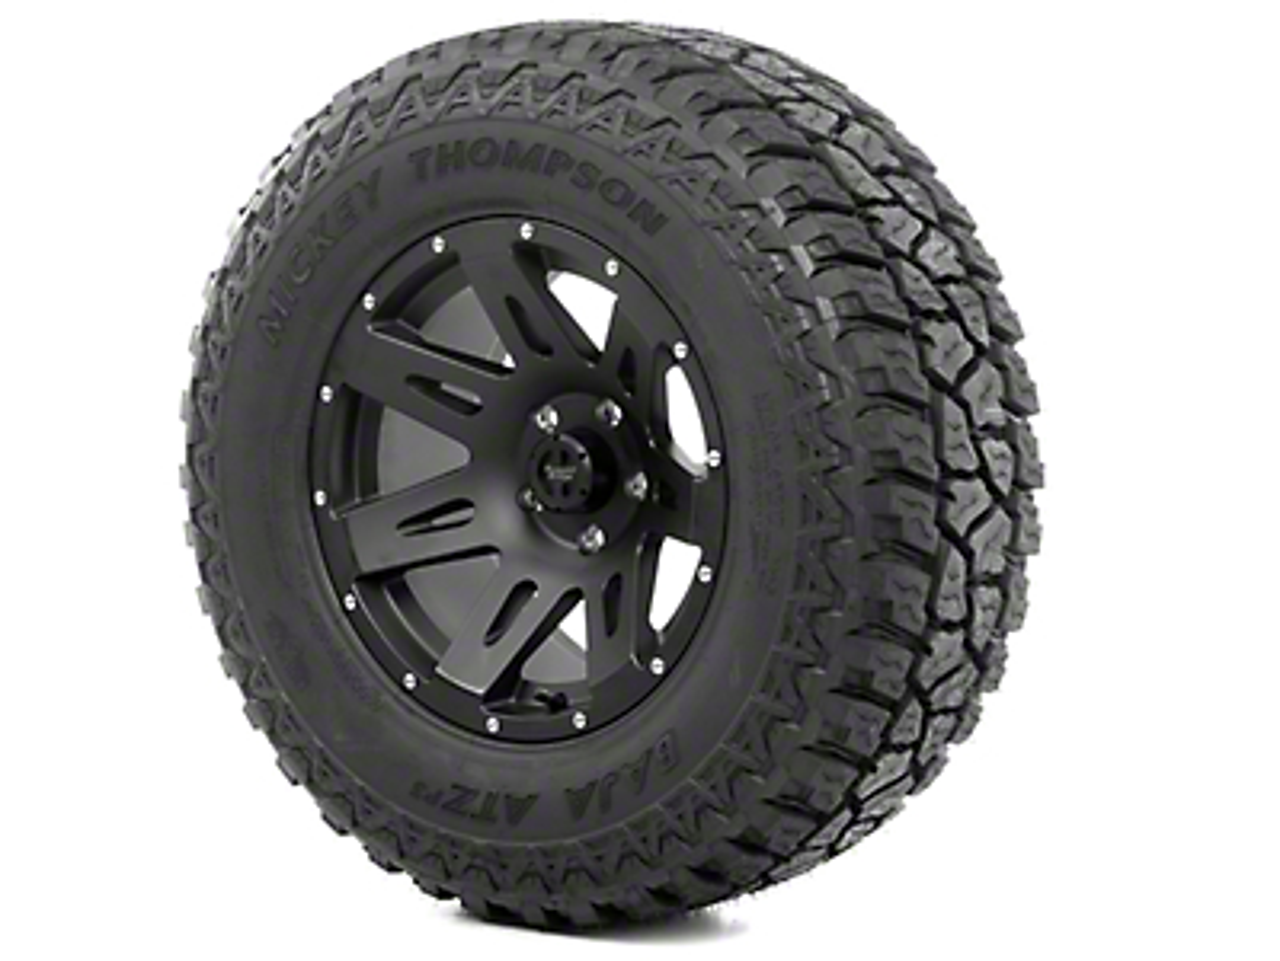 Rugged Ridge XHD Wheel 17x9 Black Satin and Mickey Thompson ATZ P3 315/70R17 Tire Kit (13-18 Jeep Wrangler JK; 2018 Jeep Wrangler JL)